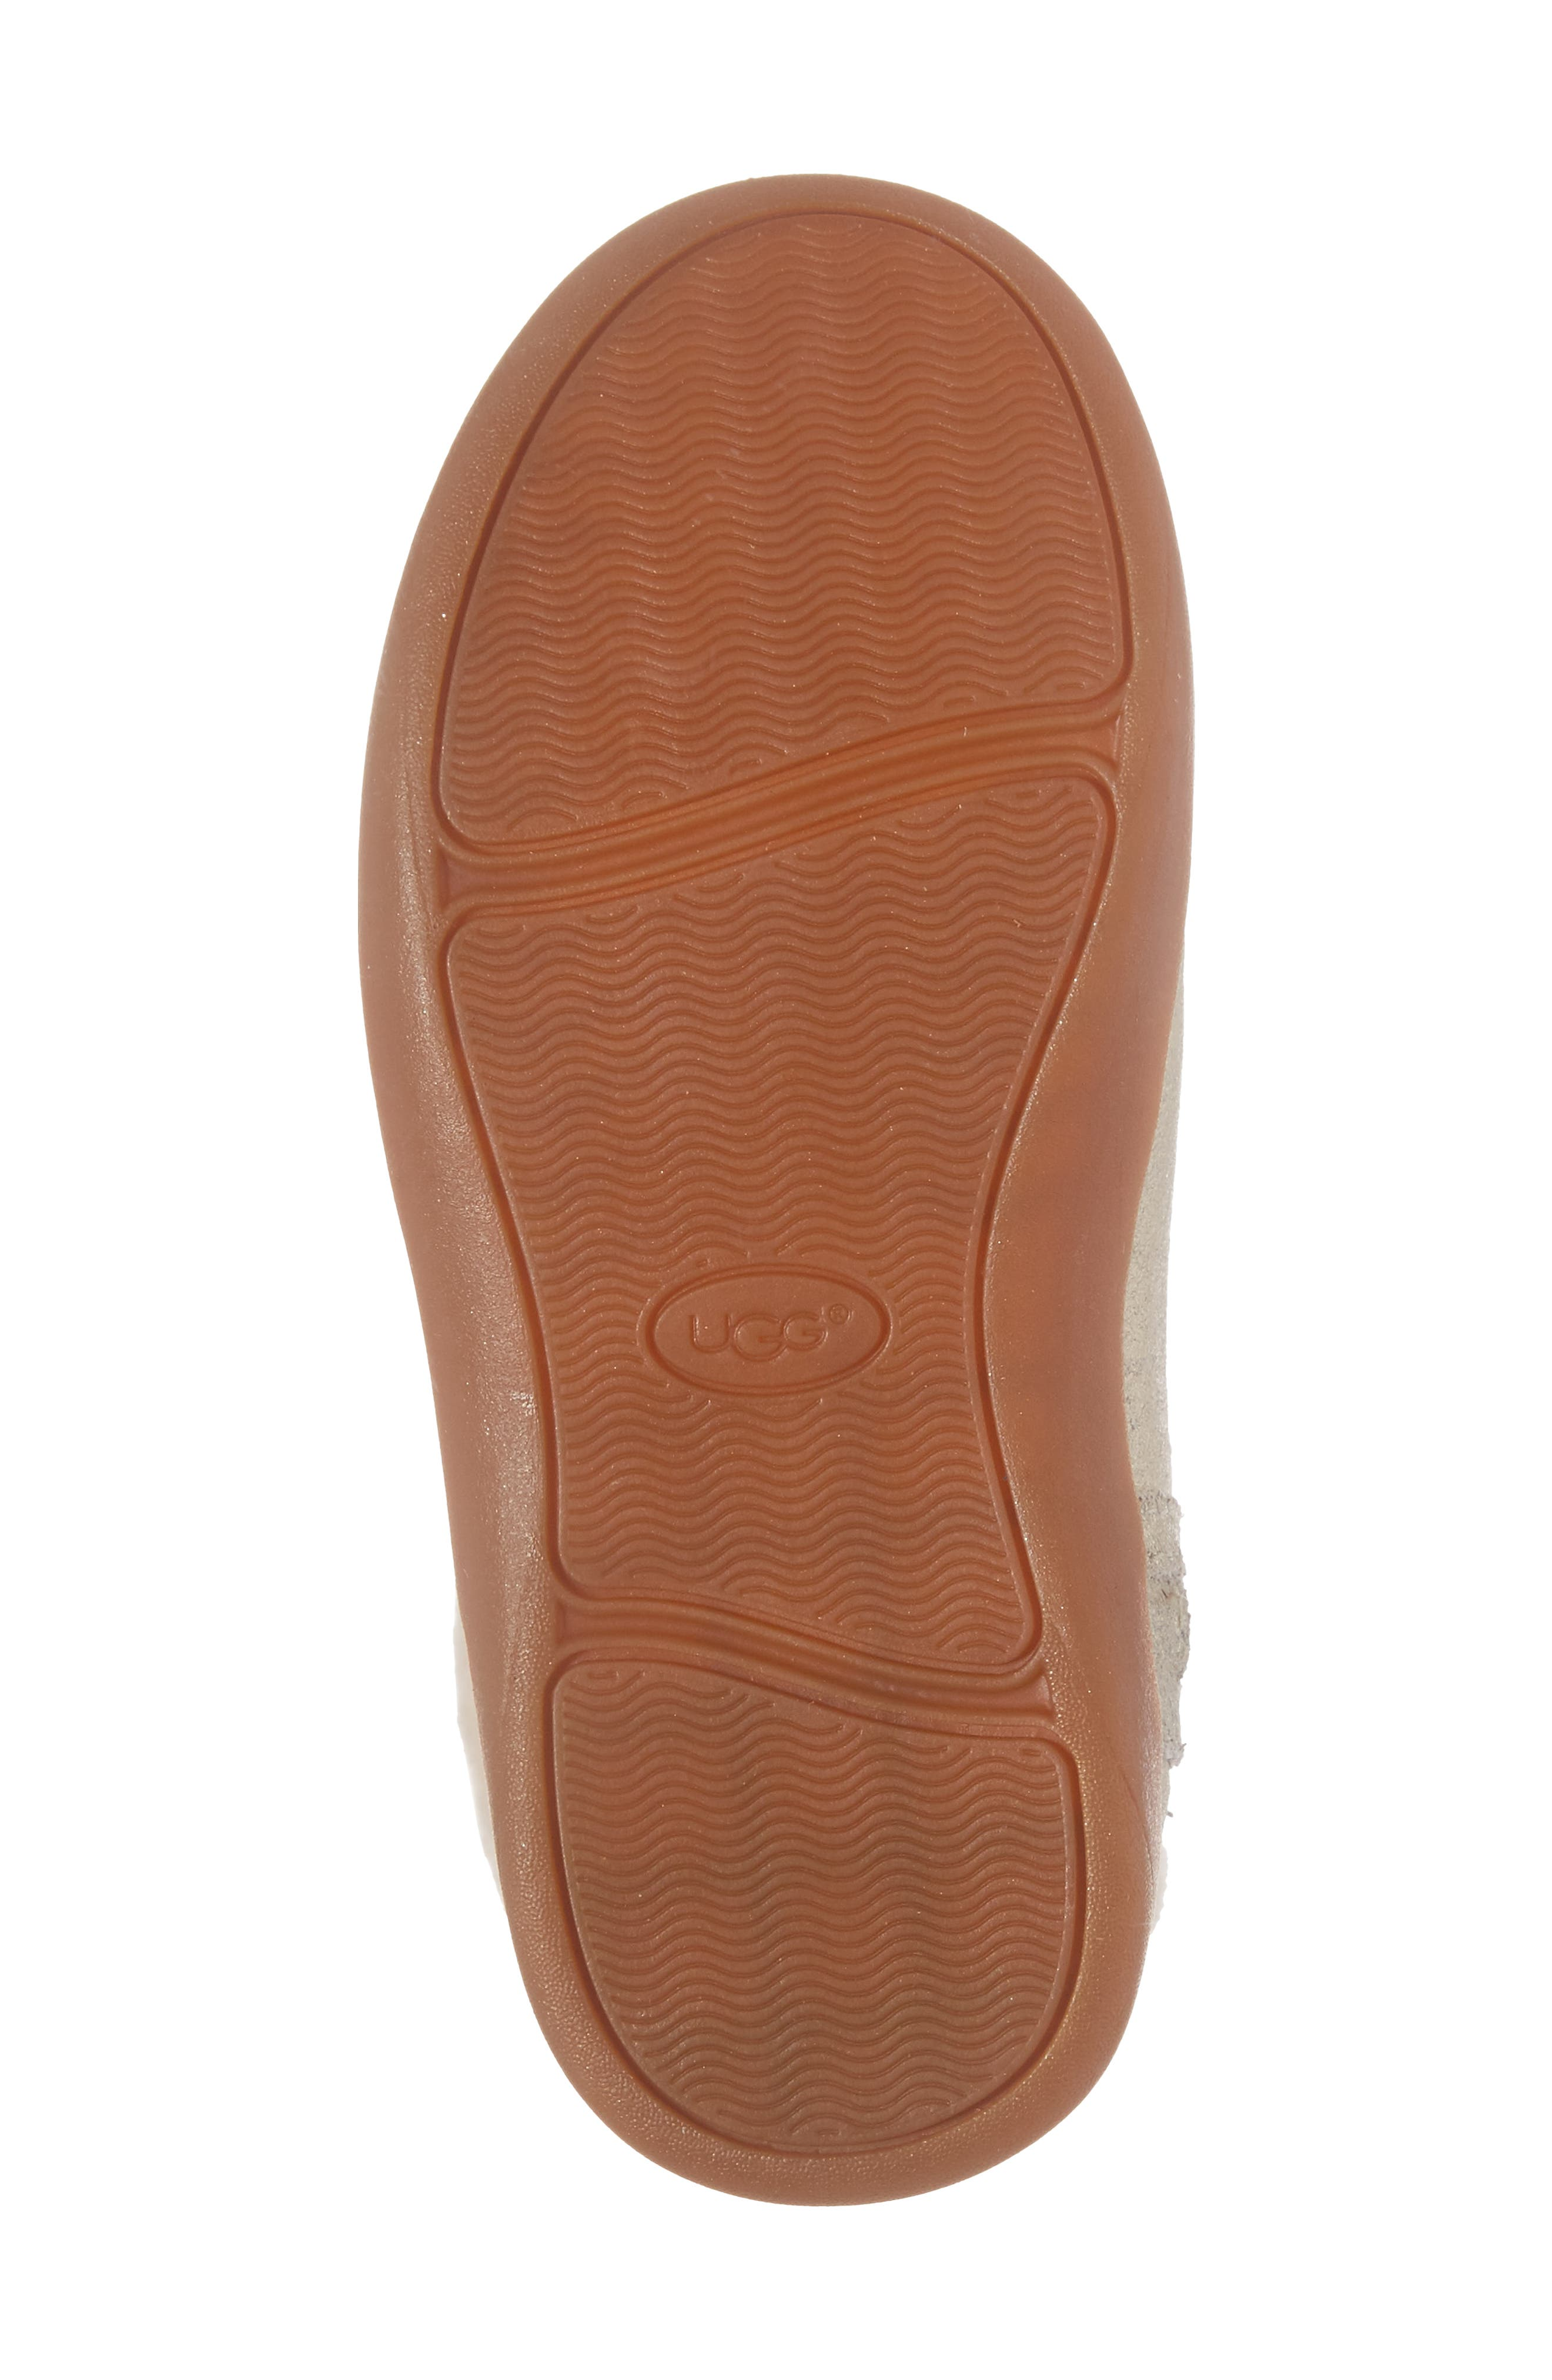 UGG<SUP>®</SUP>, Jorie II Genuine Shearling Metallic Boot, Alternate thumbnail 6, color, METALLIC GOLD